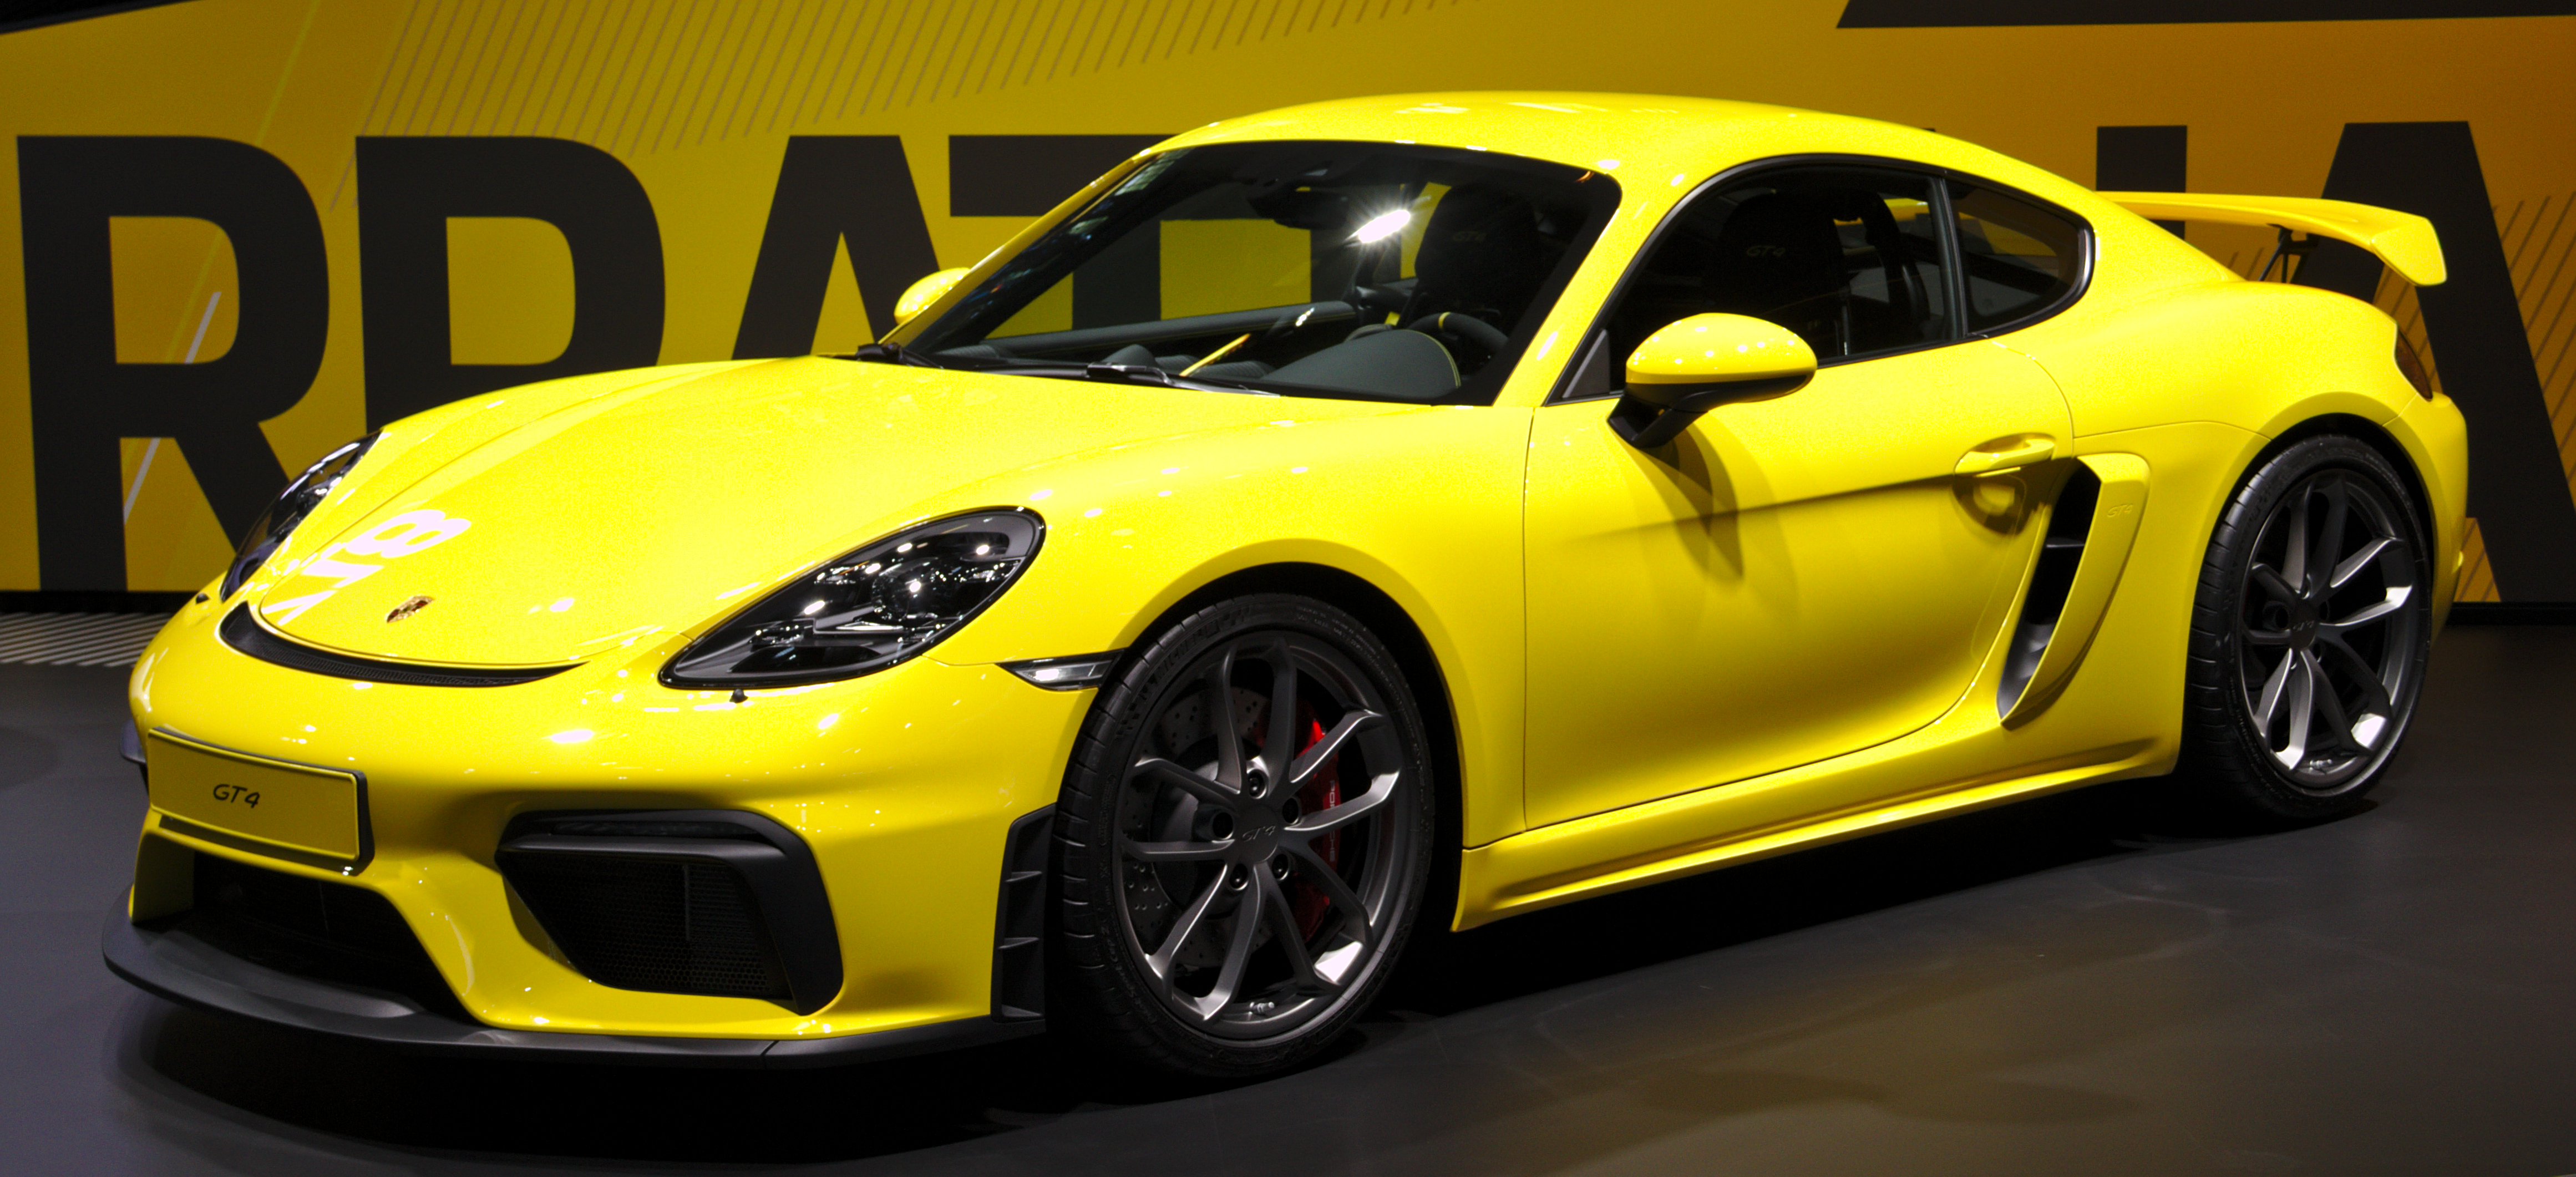 Porsche 982 Wikipedia